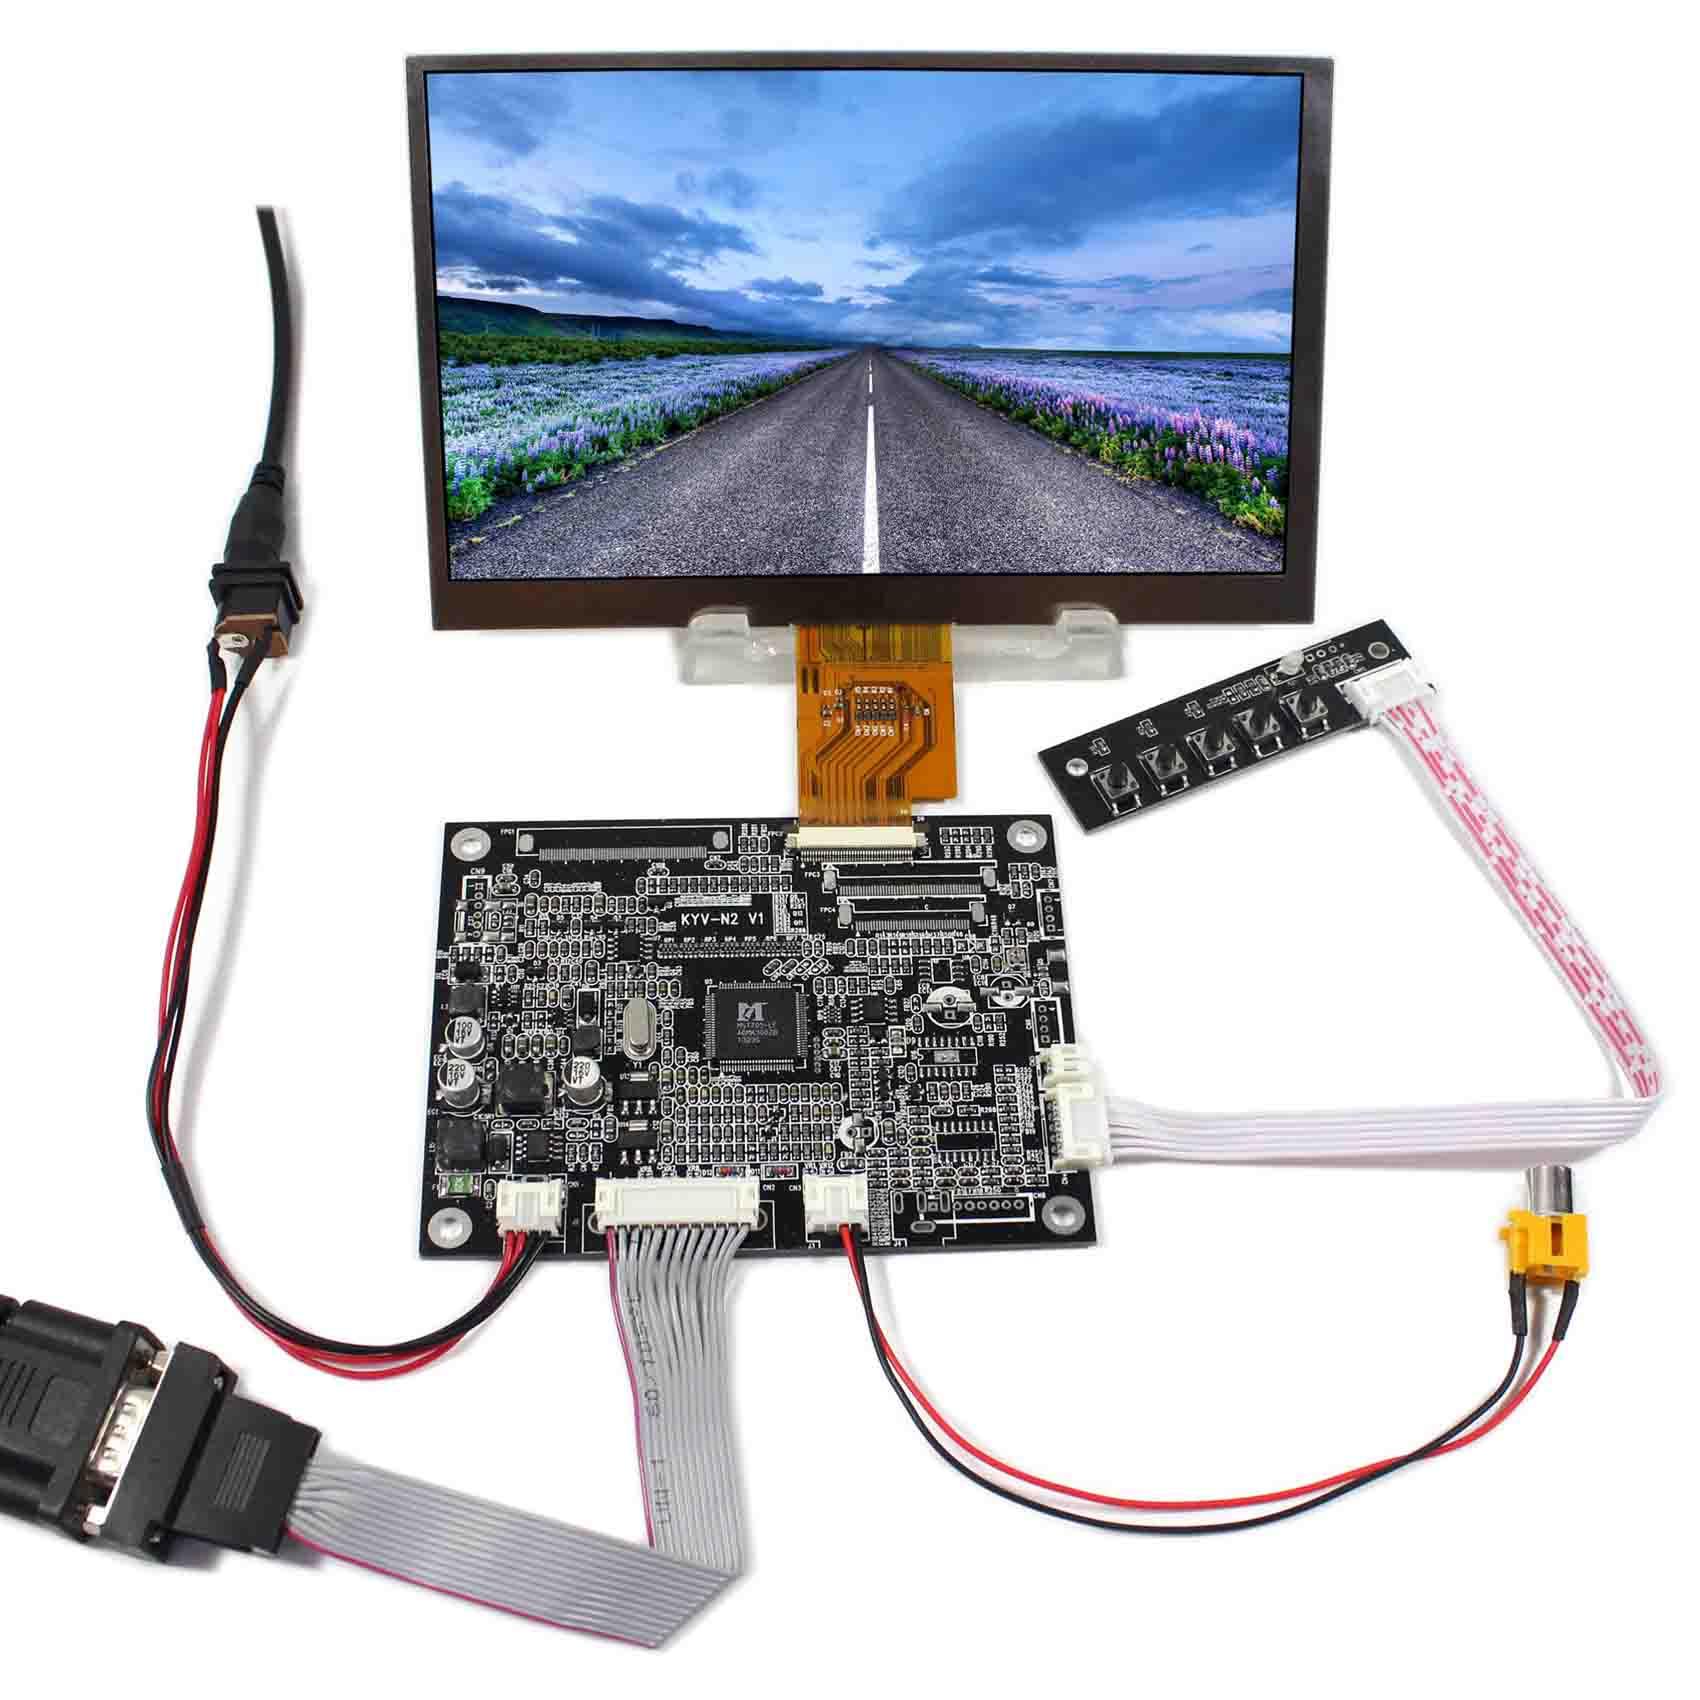 VGA 2AV LCD Controller Board+7inch 1024x600 AT070TNA2 LCD Screen vga 2av reversing lcd controller board with 7inch 1024x600 at070tna2 lcd screen